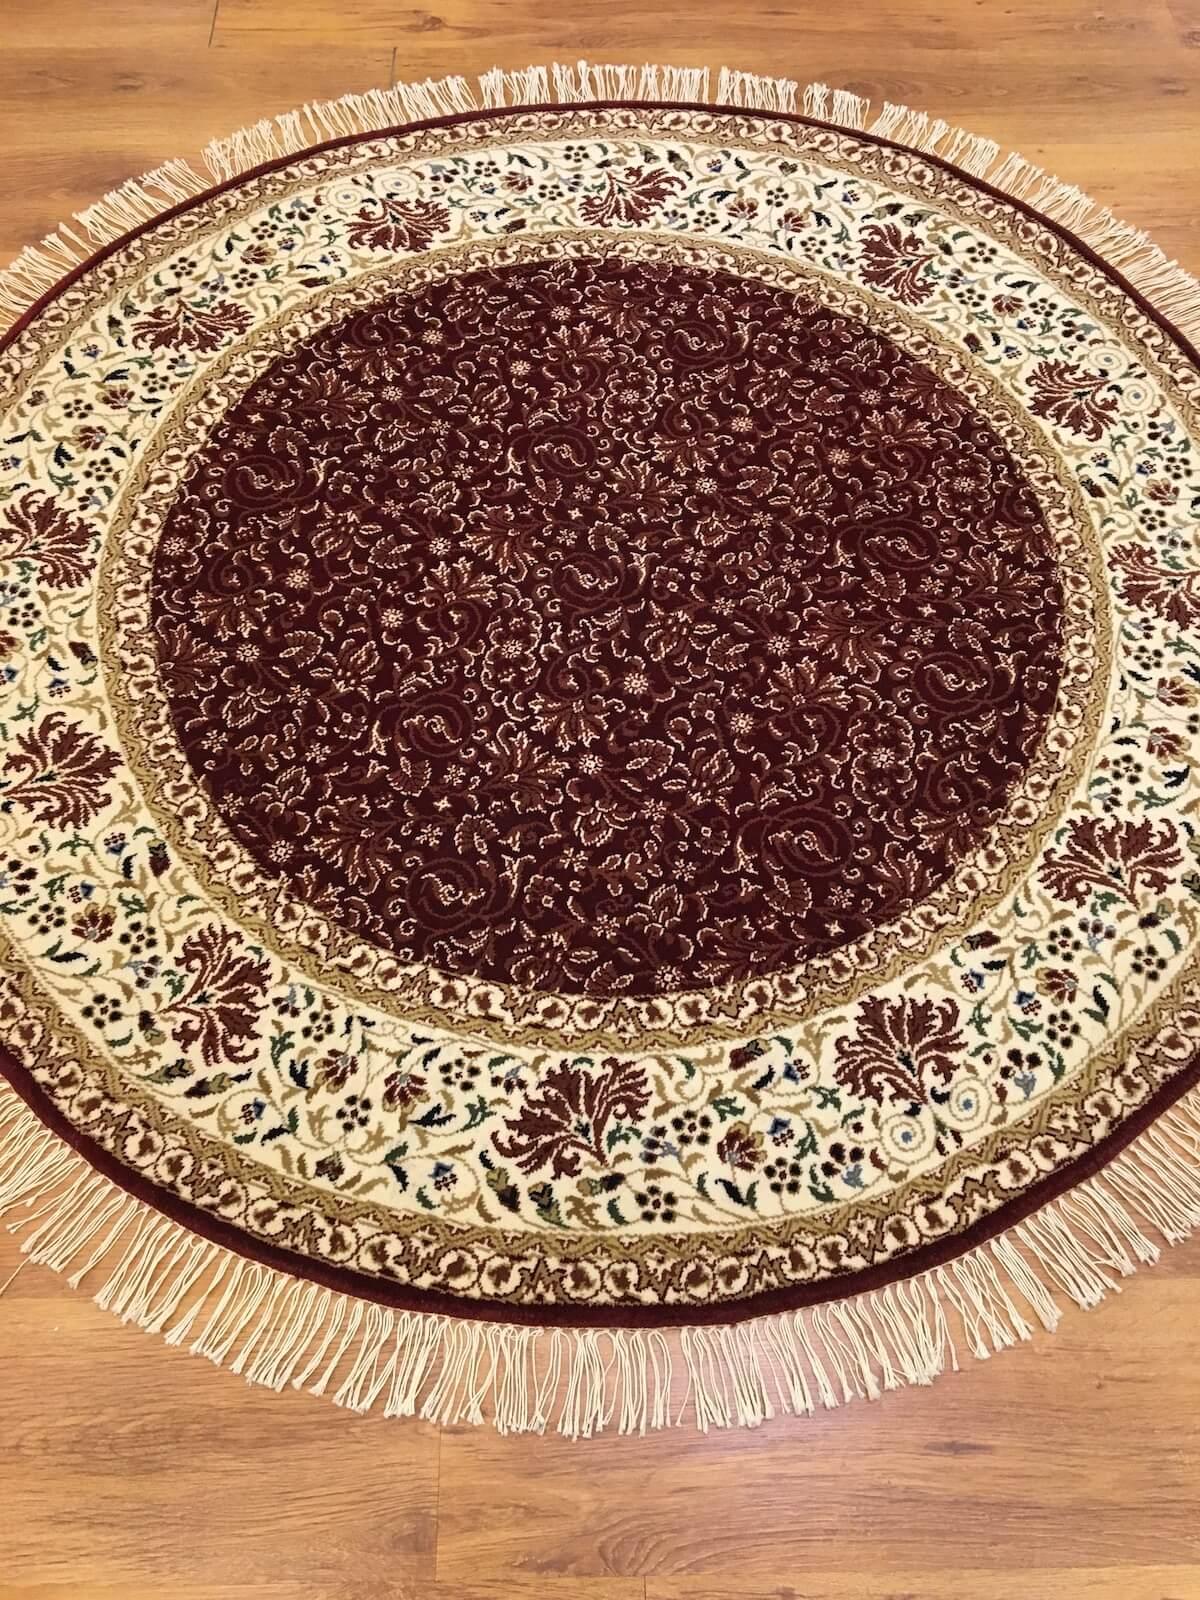 SULTANBEYLİ BUTİK HALI YUVARLAK 146X146 Sultanbeyli Butik Halı